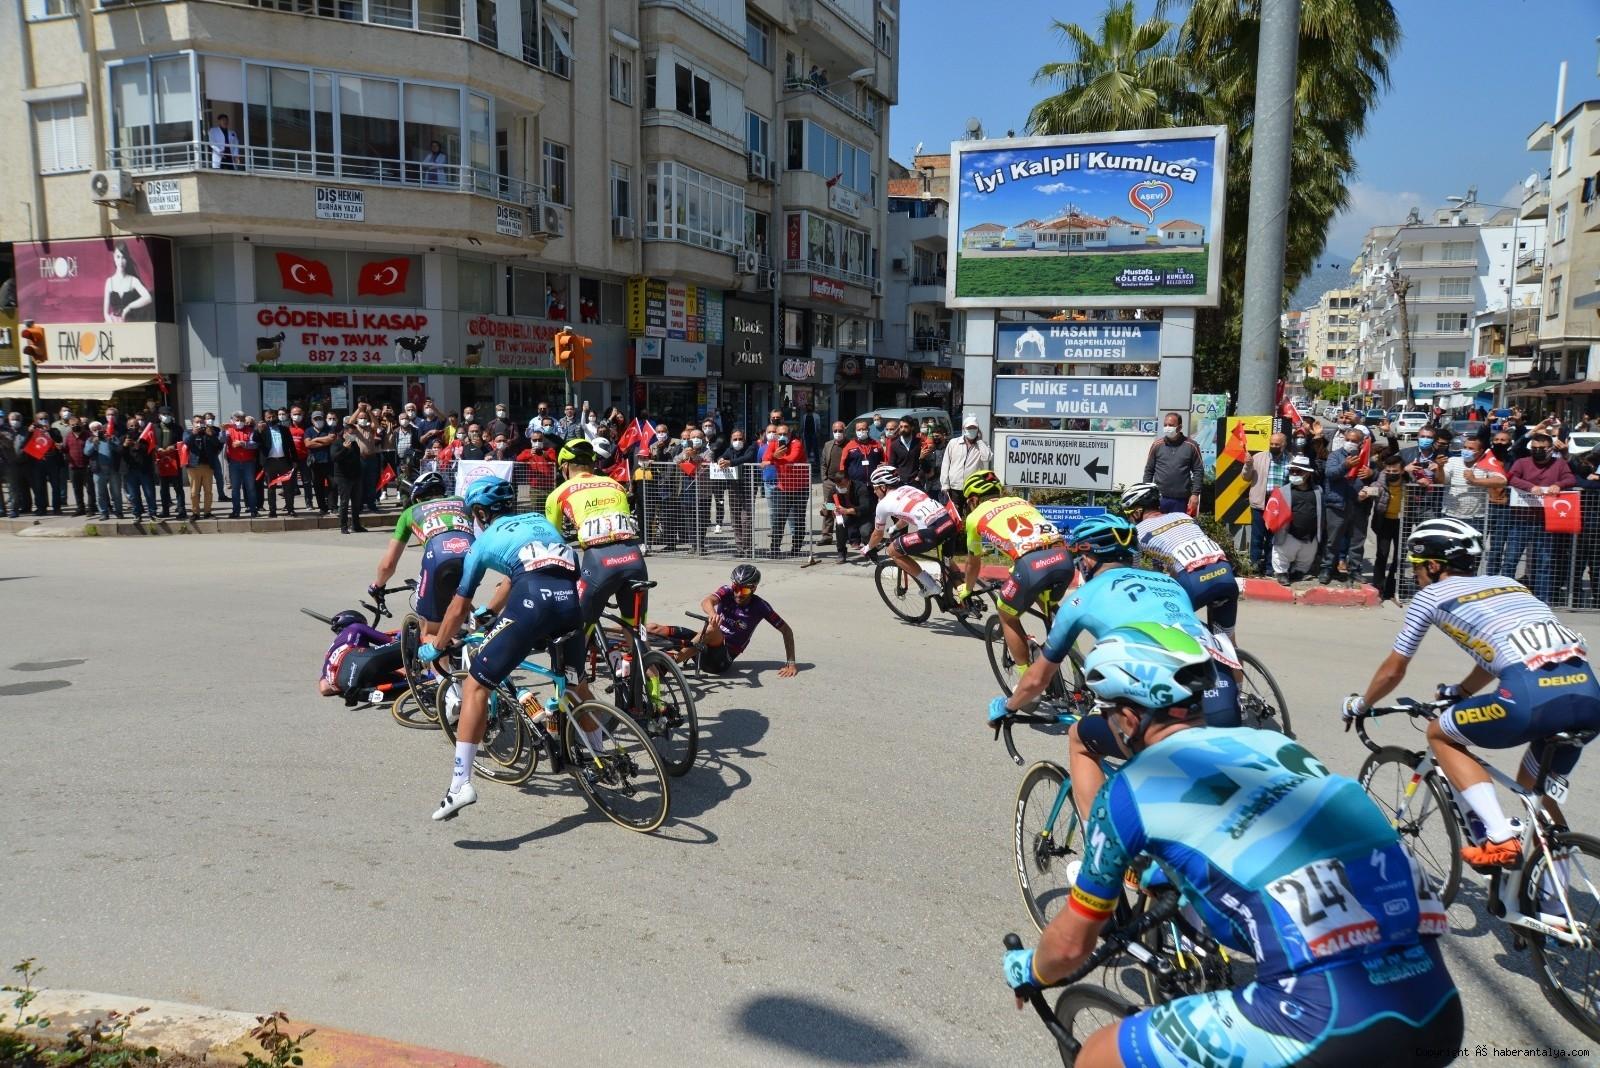 2021/04/56-cumhurbaskanligi-turkiye-bisiklet-turunda-kaza-ucuz-atlatildi-20210415AW29-1.jpg